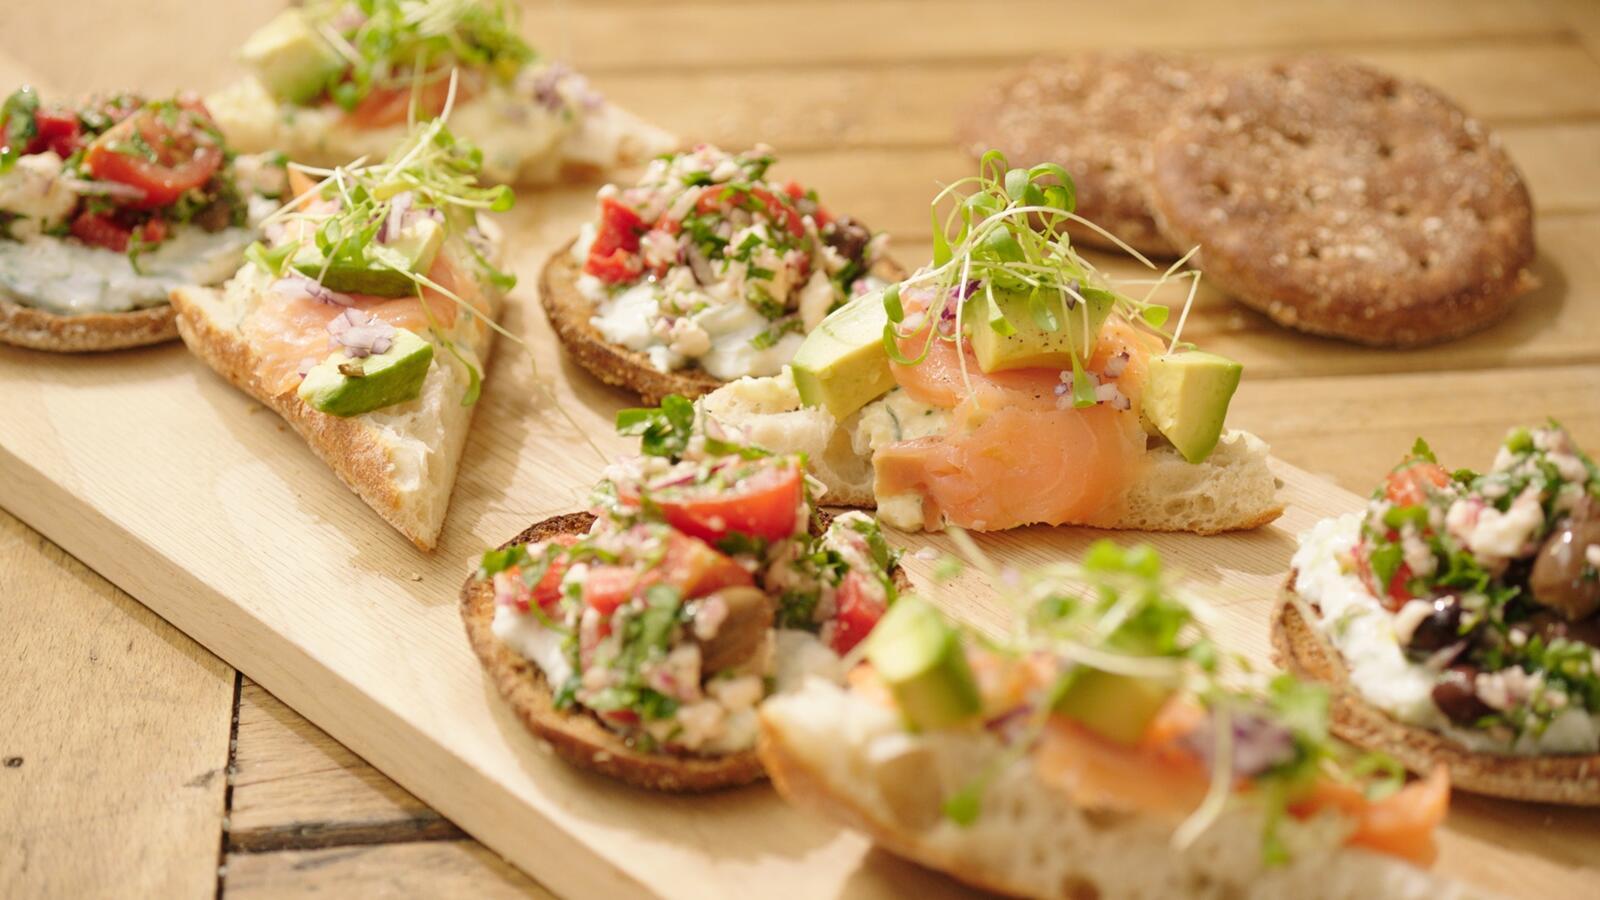 Broodje met Griekse salade en ciabatta met eiersla, avocado en gerookte zalm